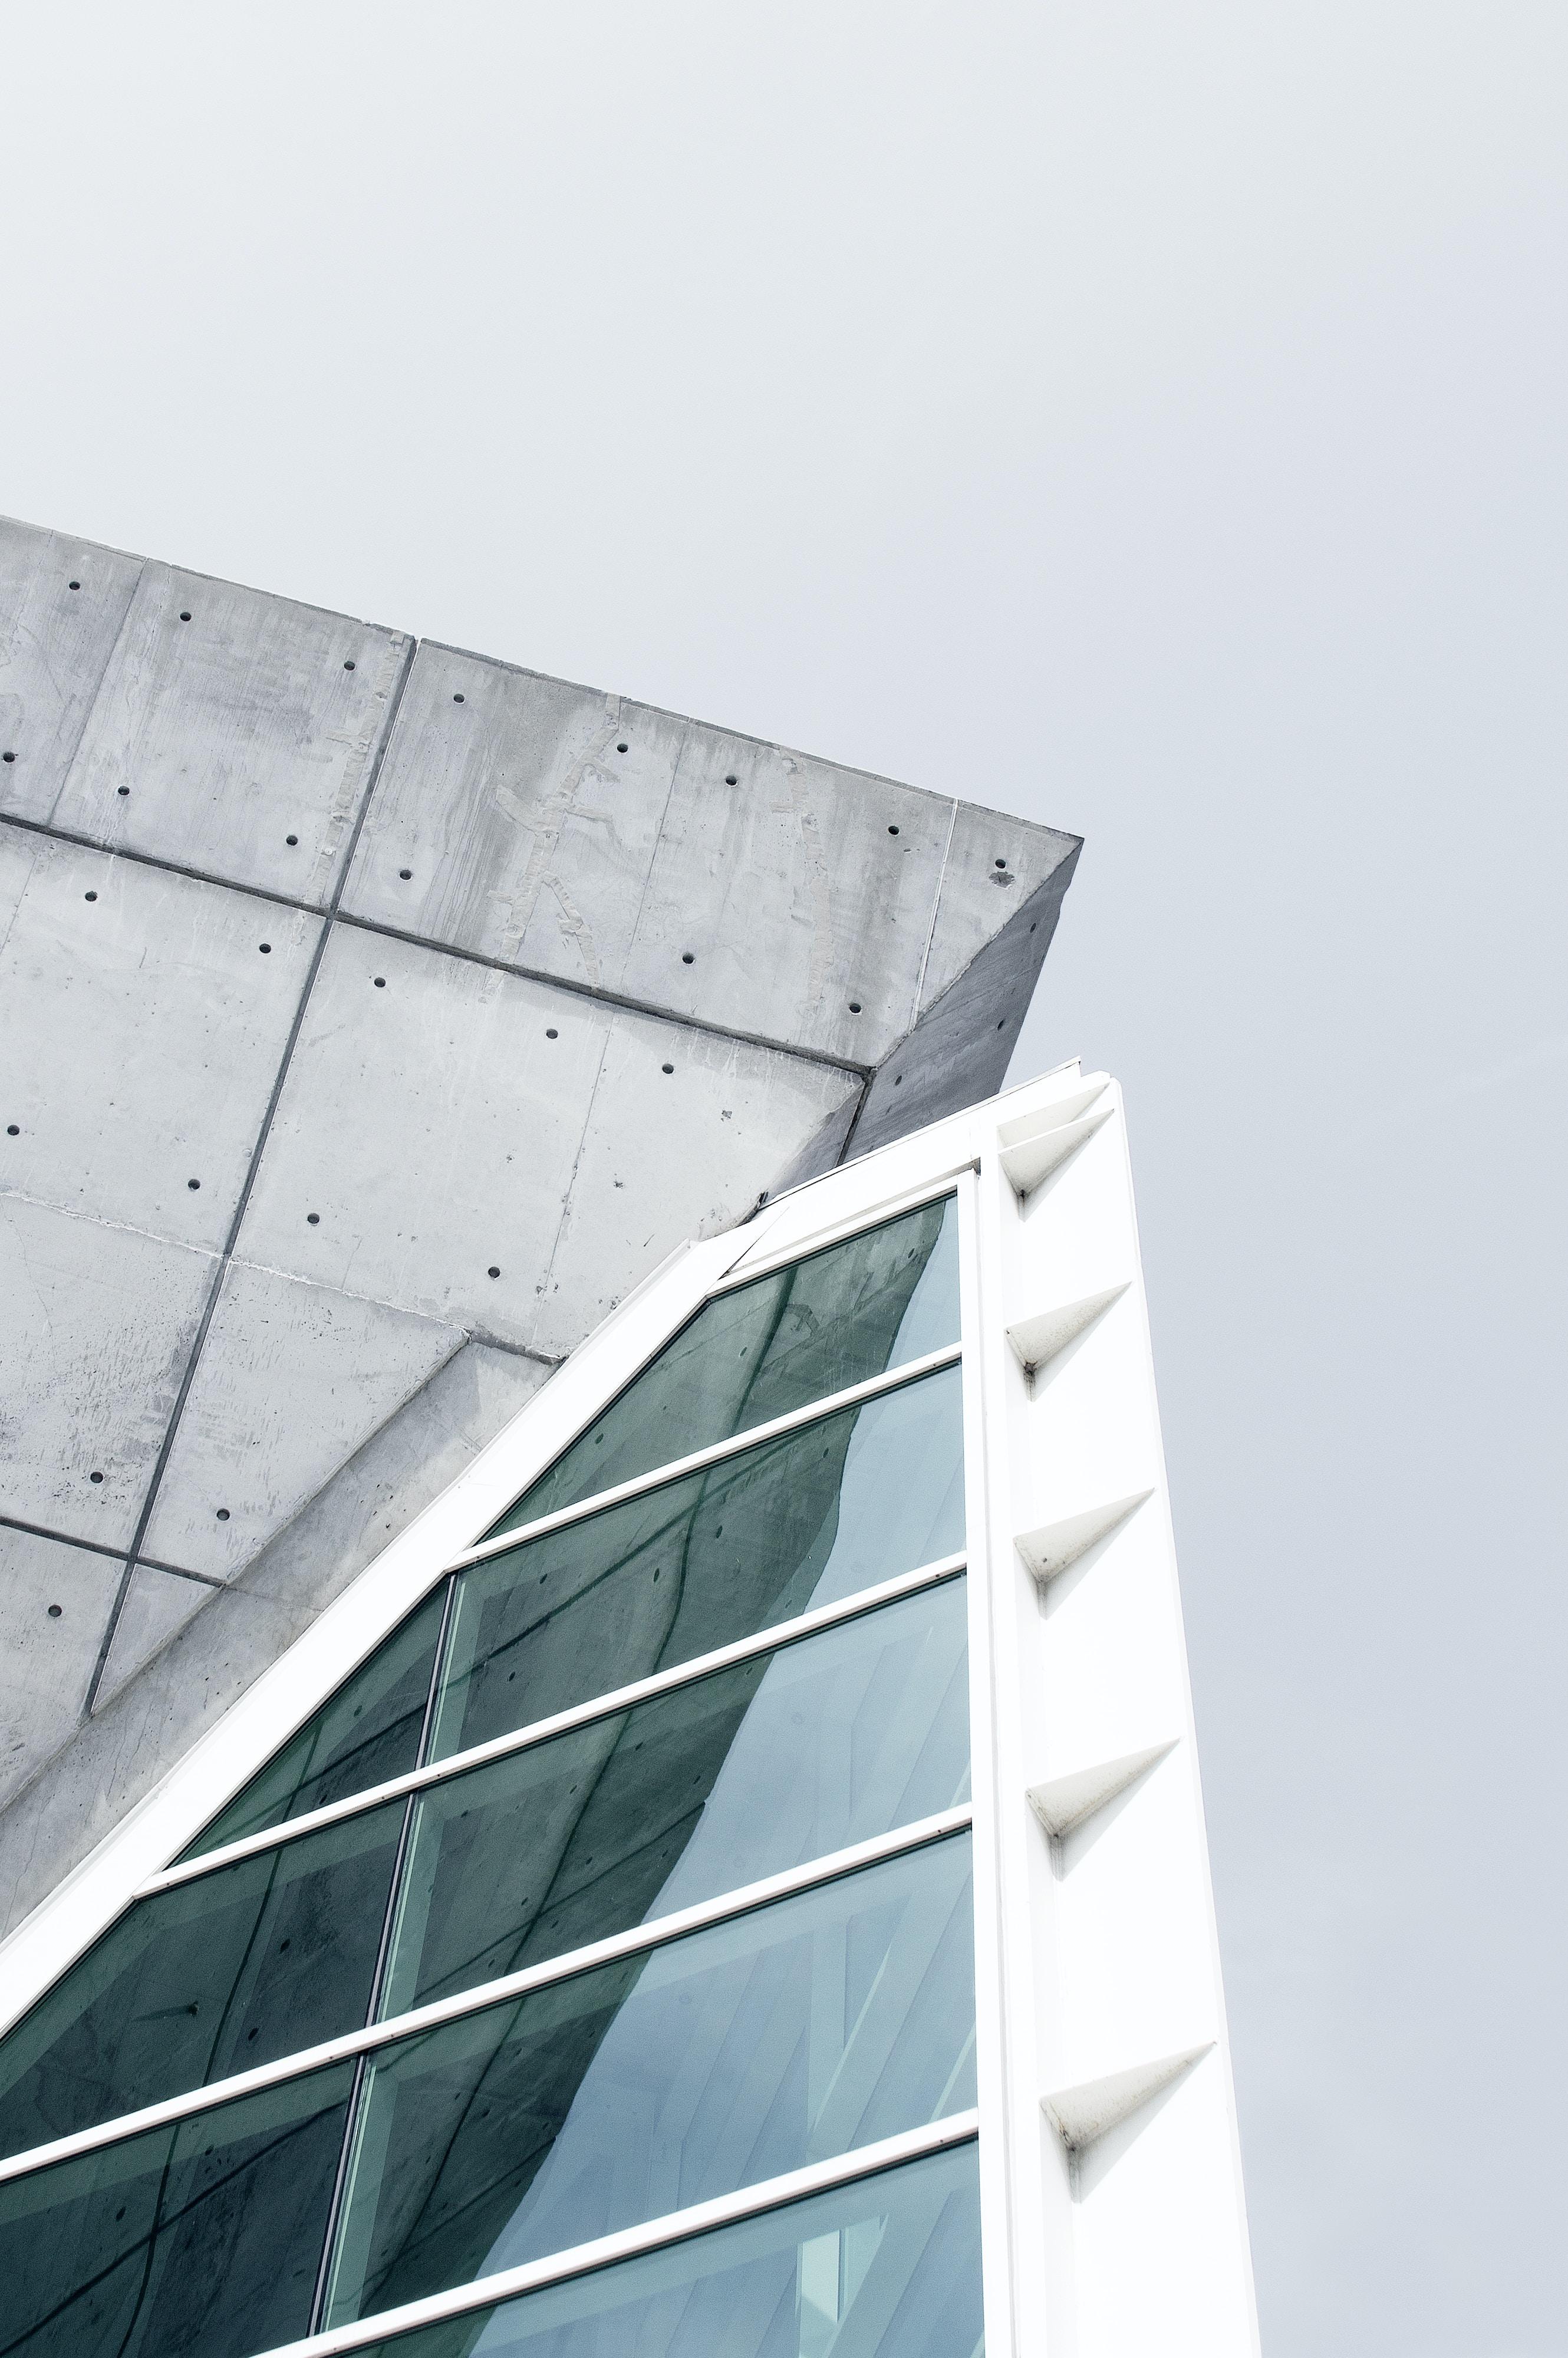 gray and white concrete building